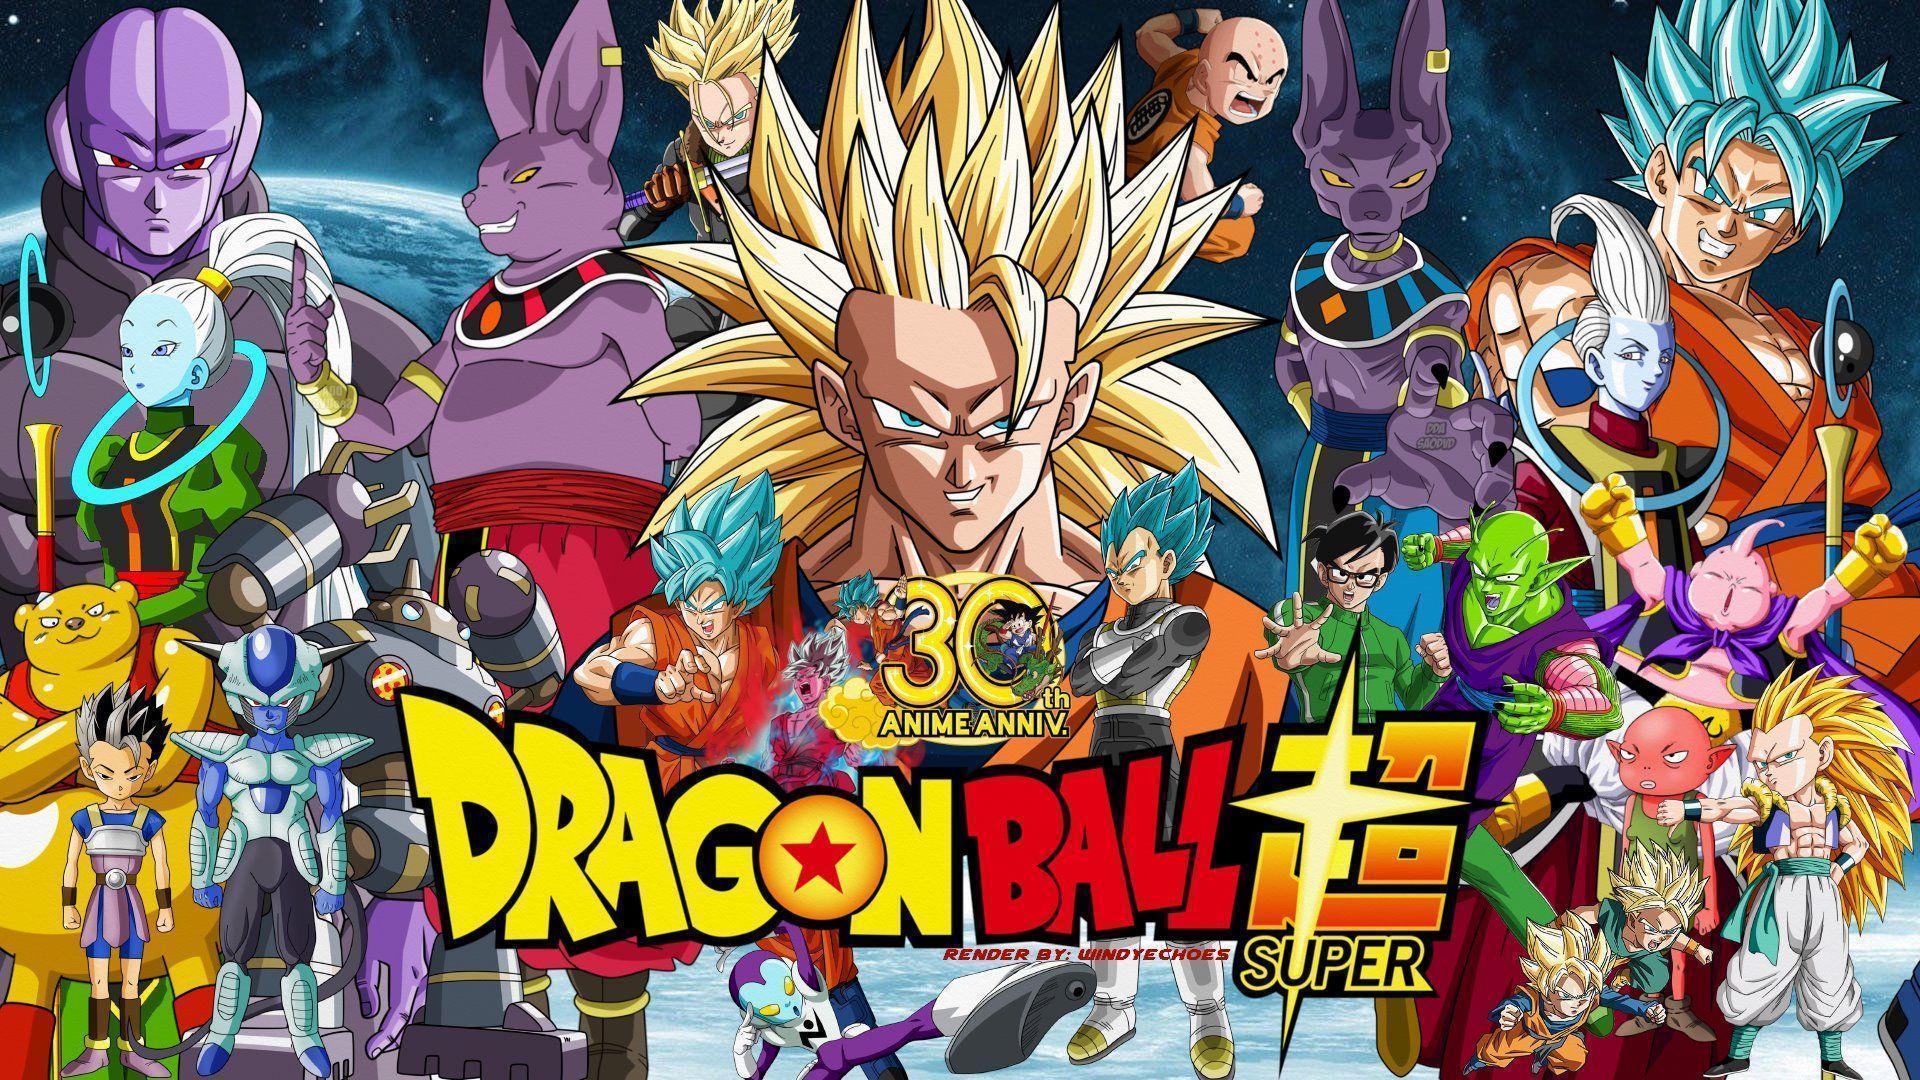 Dragon Ball Desktop Wallpapers Top Free Dragon Ball Desktop Backgrounds Wallpaperaccess